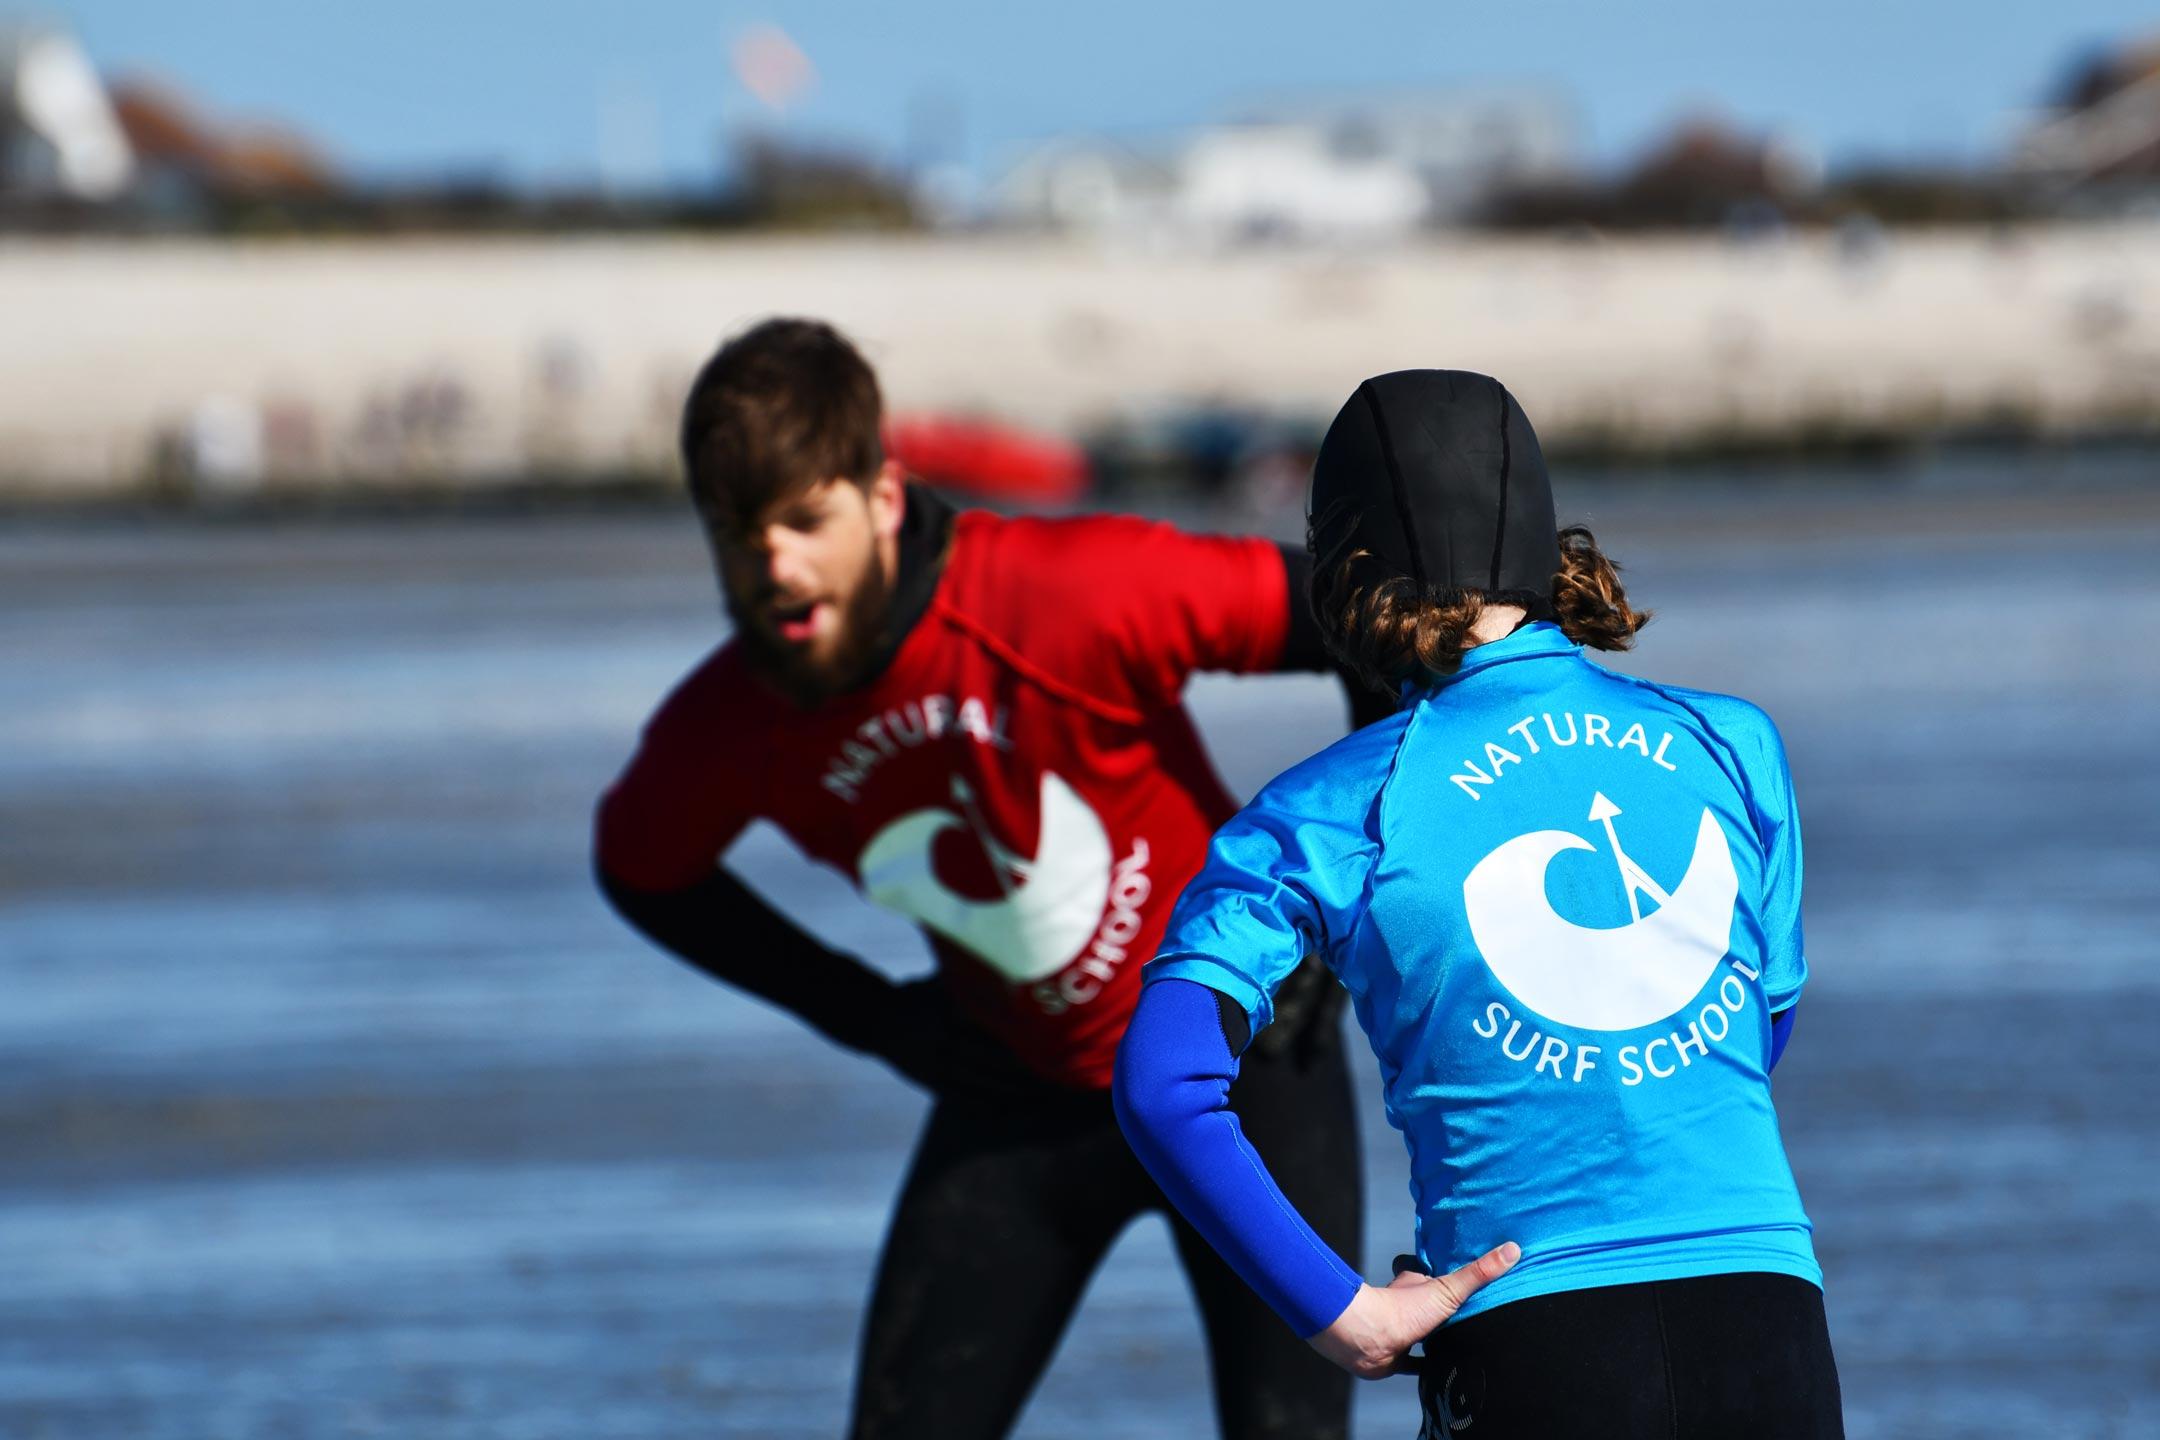 surf instructor teaching kids surf lesson